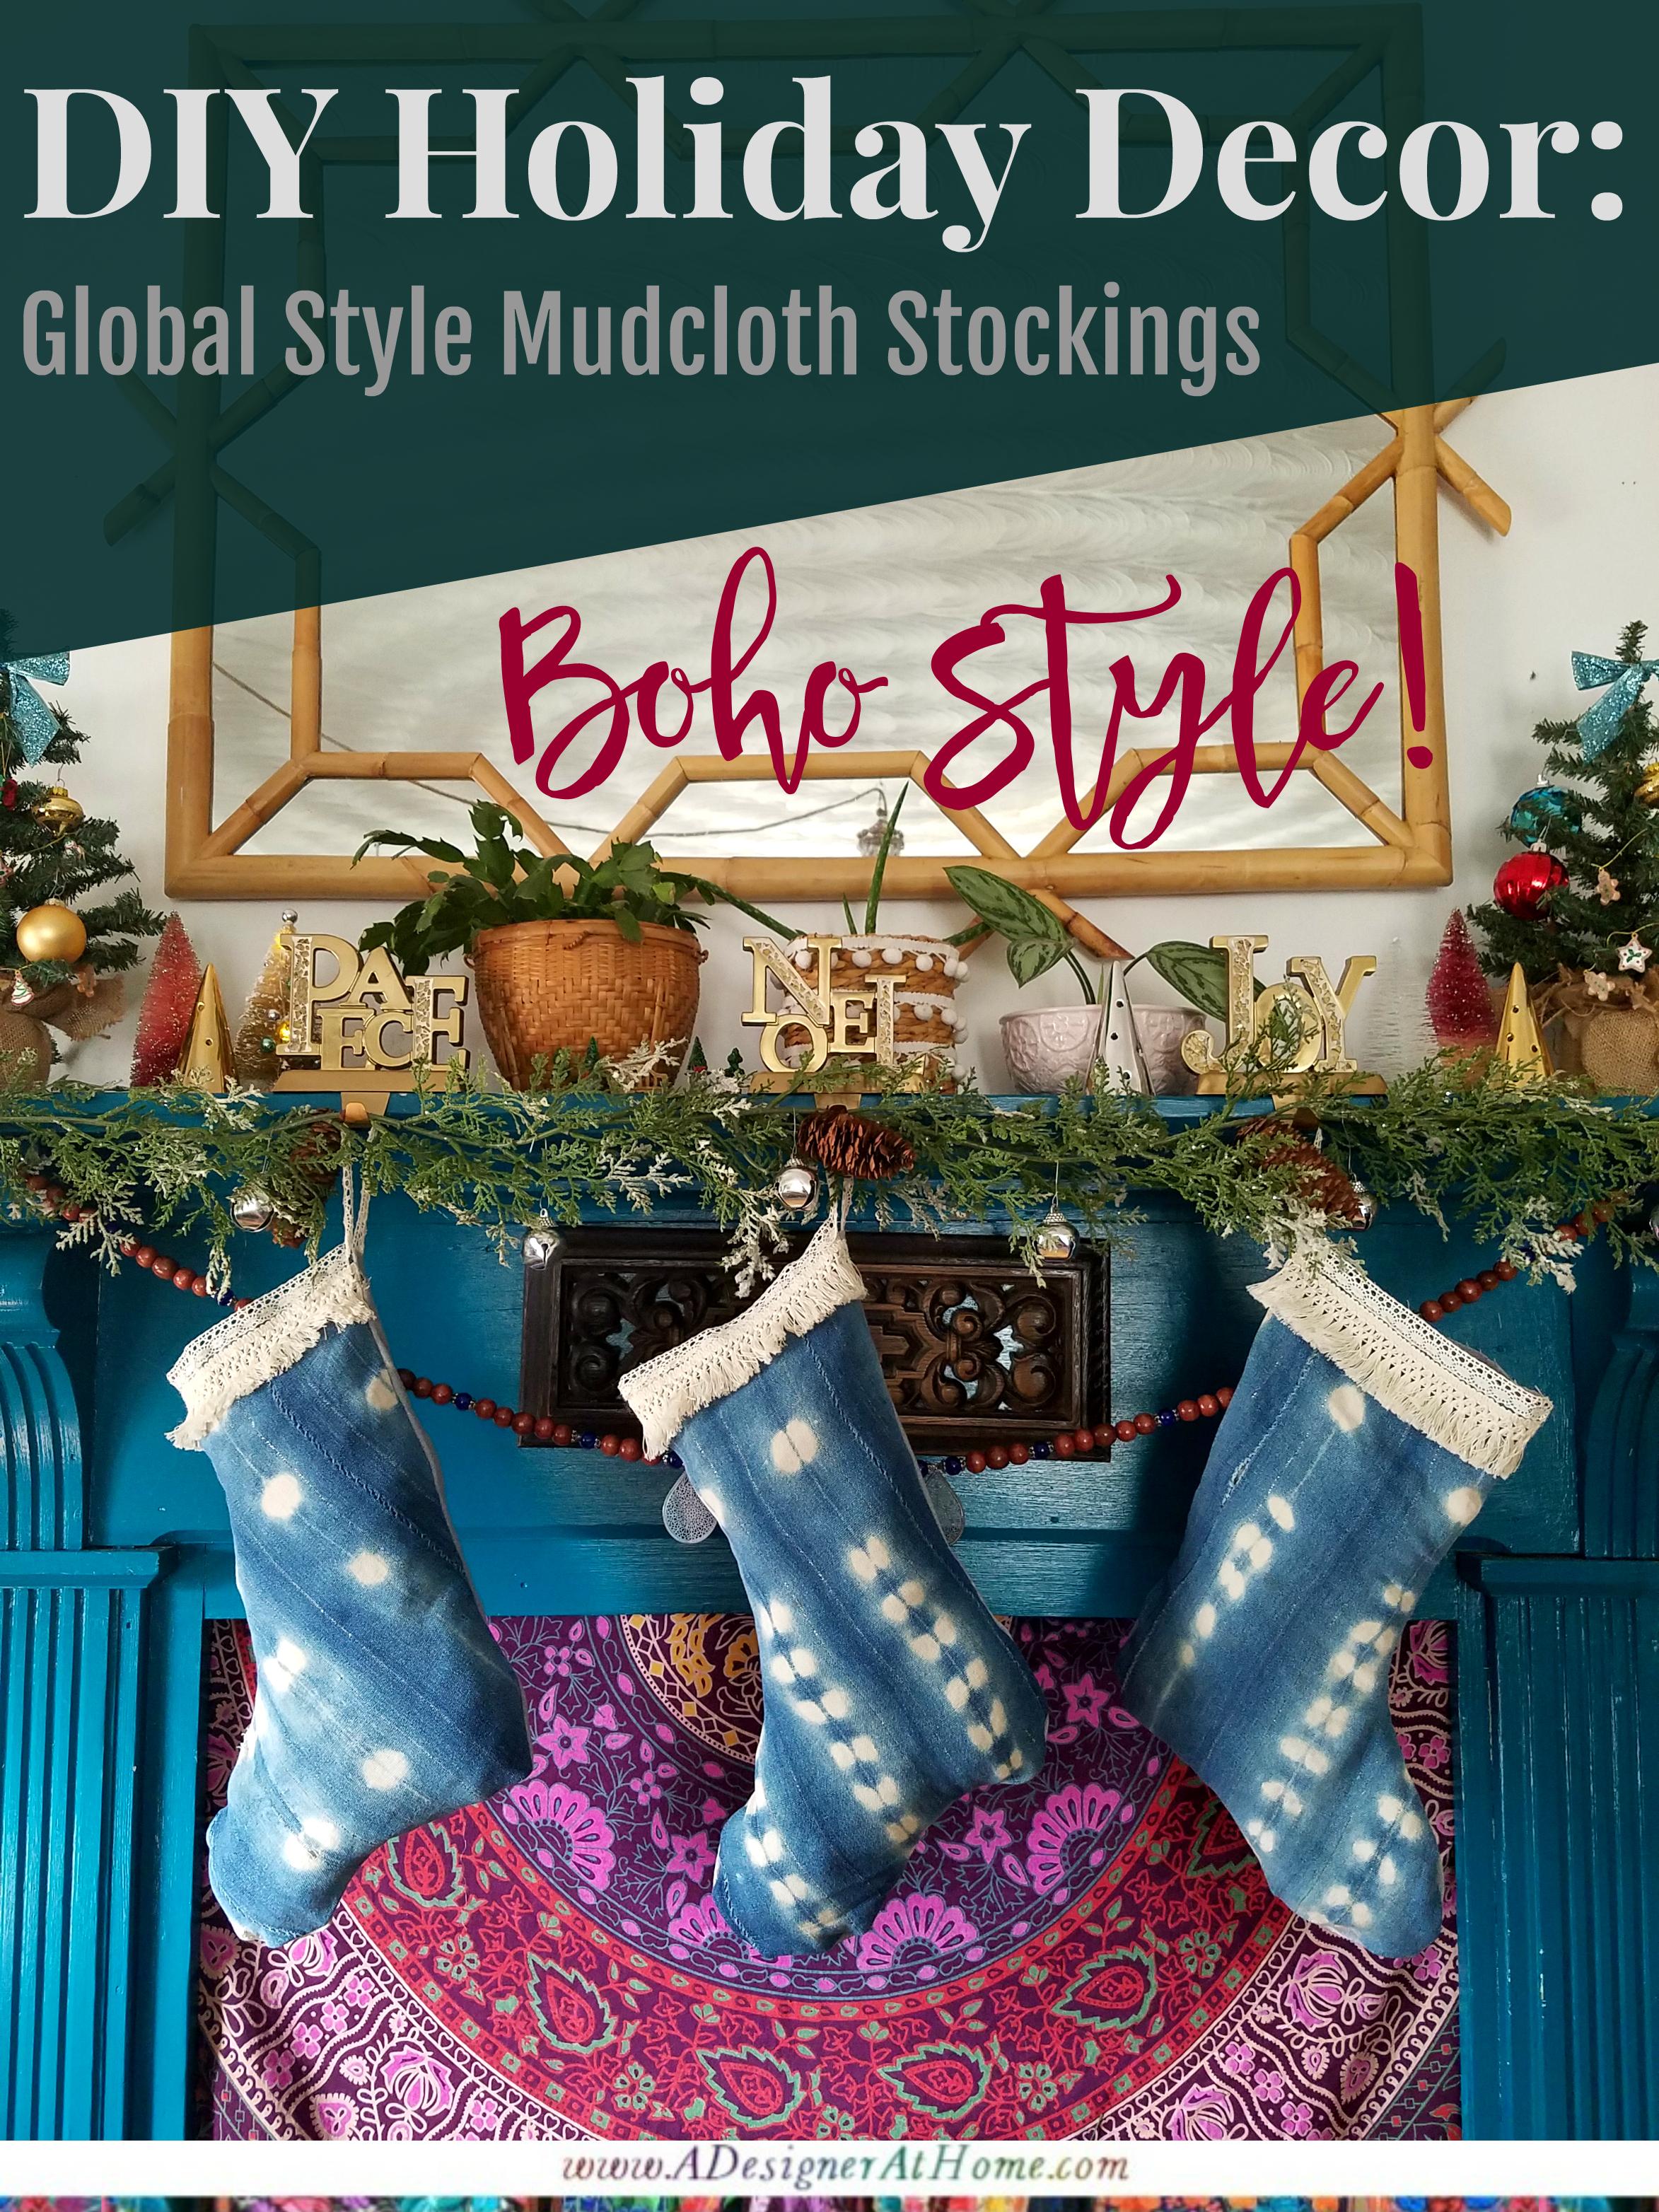 DIY Mudcloth Stocking- decorative stocking tutorial- boho style Christmas